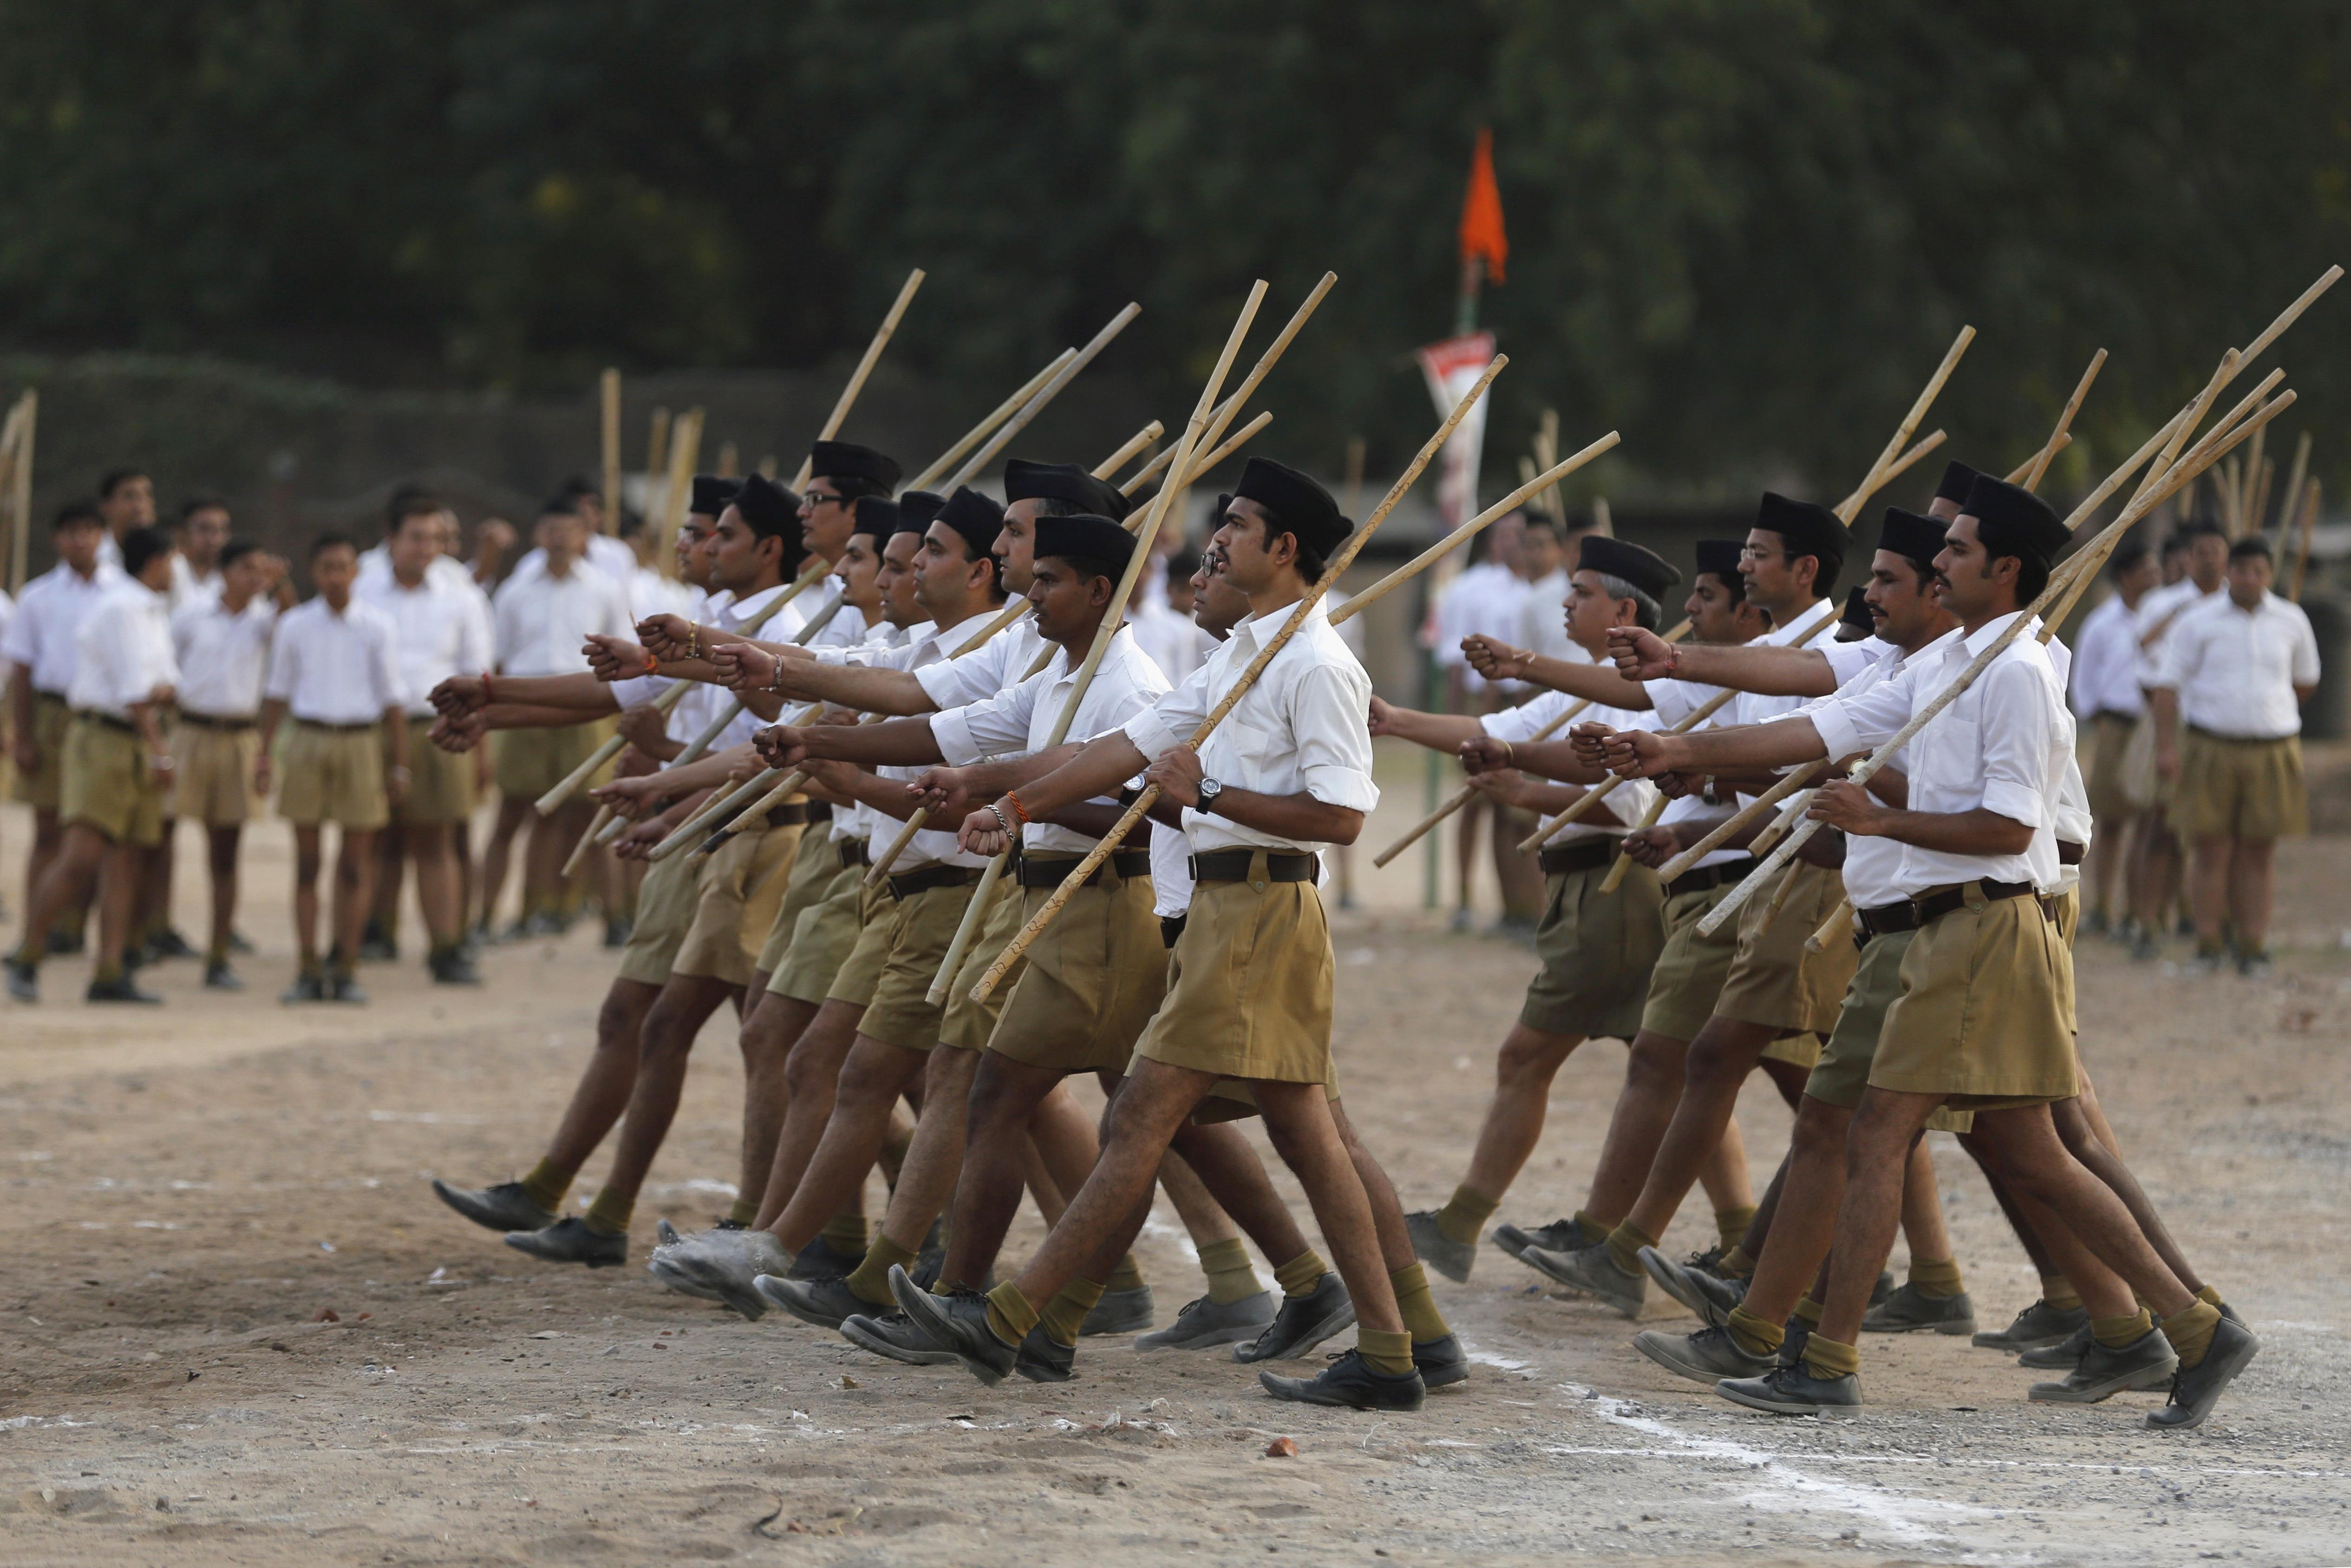 Volunteers of the Hindu nationalist organization Rashtriya Swayamsevak Sangh take part in the Path-Sanchalan (Volunteer March) during celebrations to mark the festival of Dussehra in Ahmedabad, India, on Oct. 18, 2015